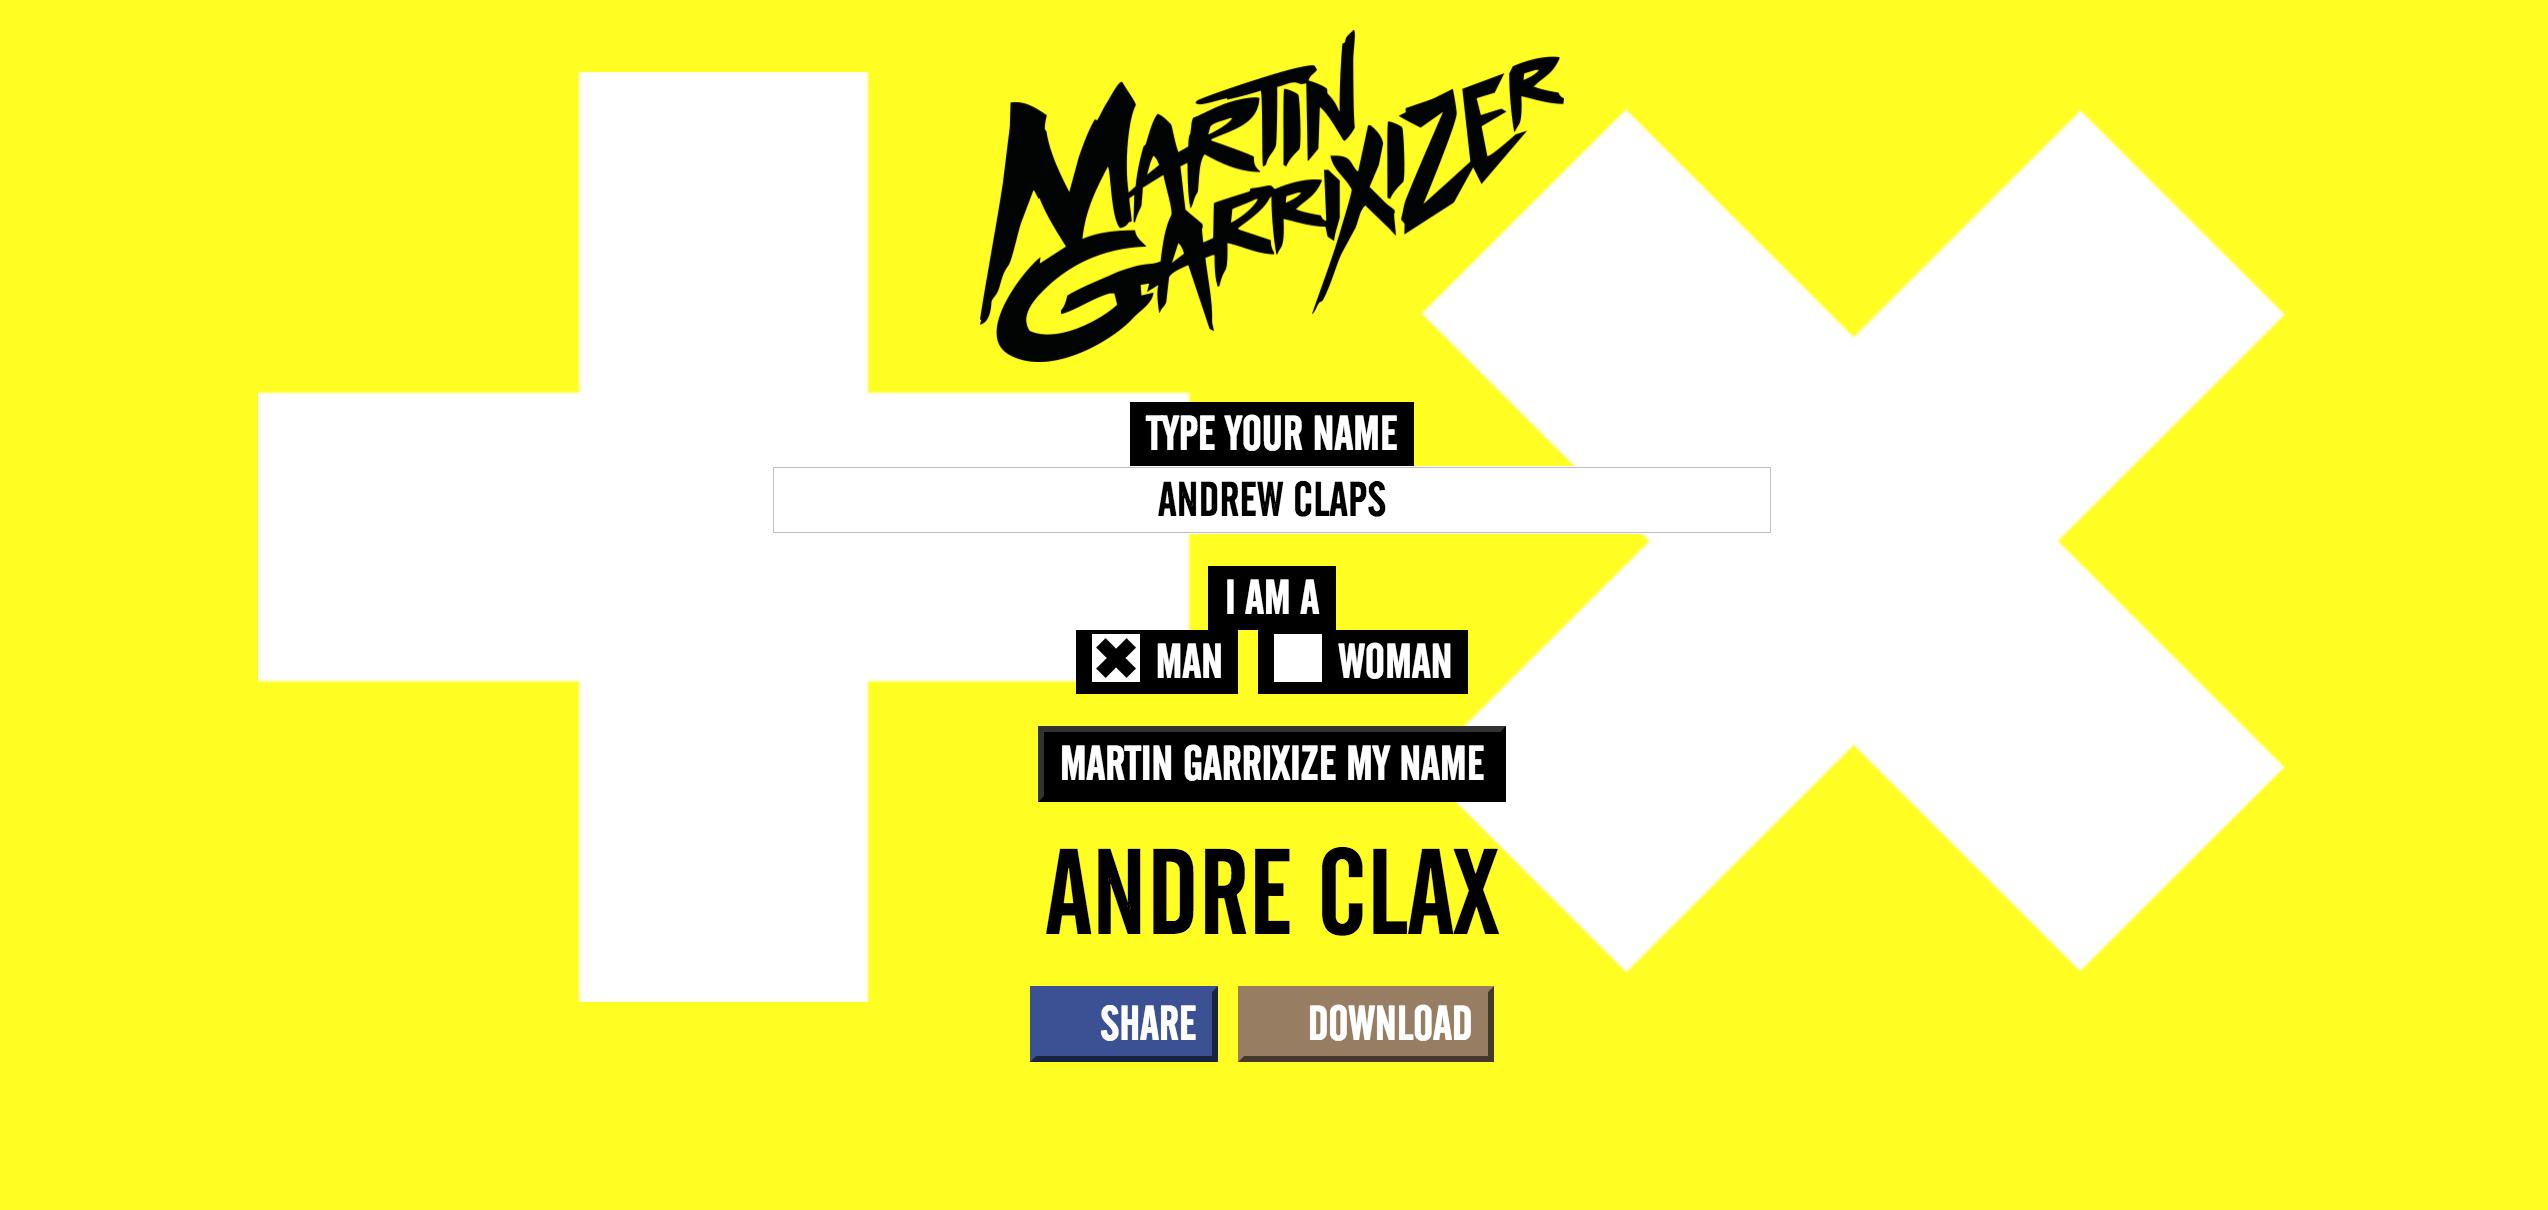 martin garrixizer